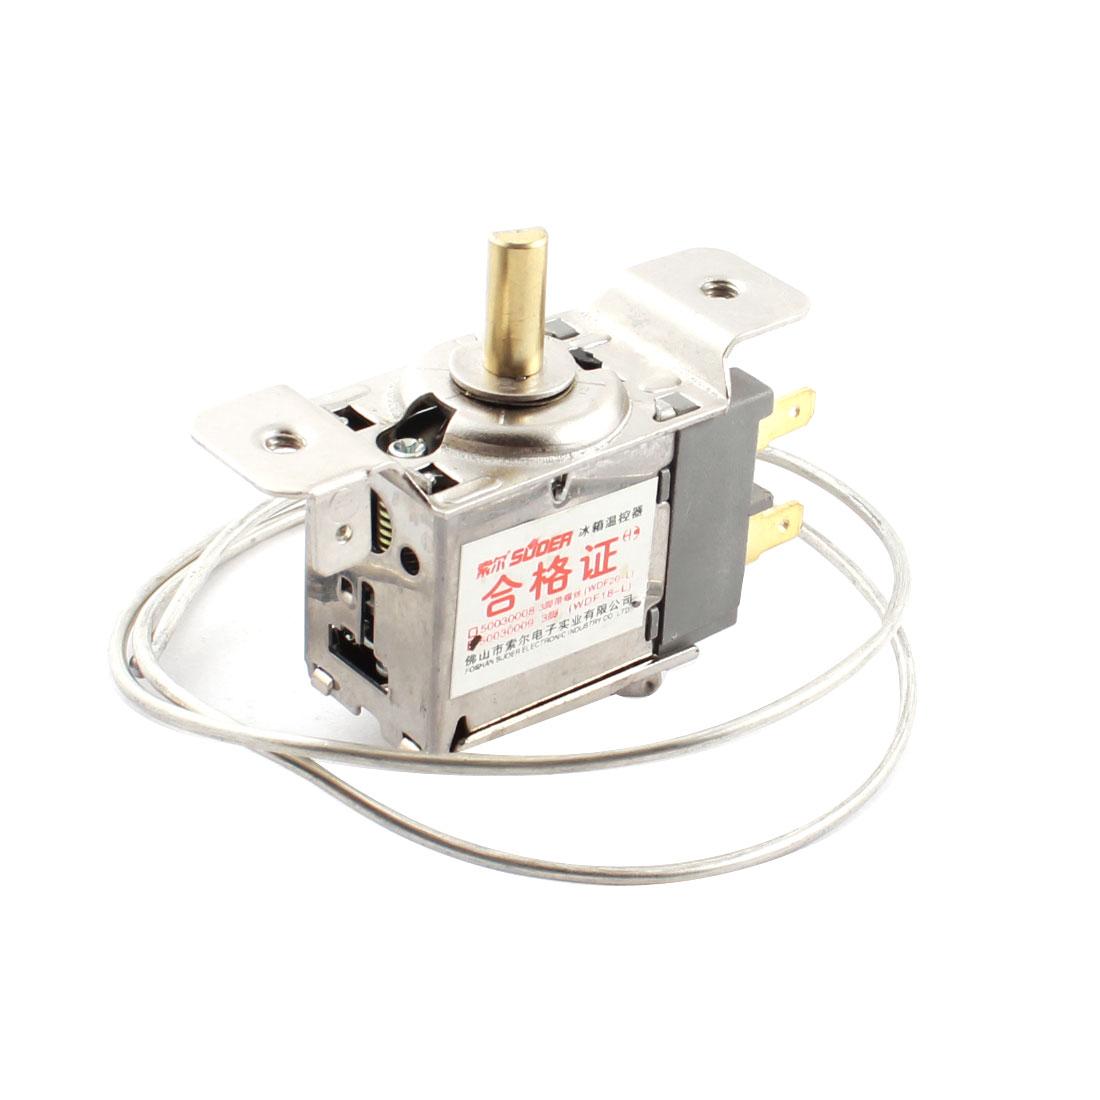 WDF18-L Refrigerator 65cm Long Cord 3P Temperature Controller Thermostat AC 250V 5(4)A